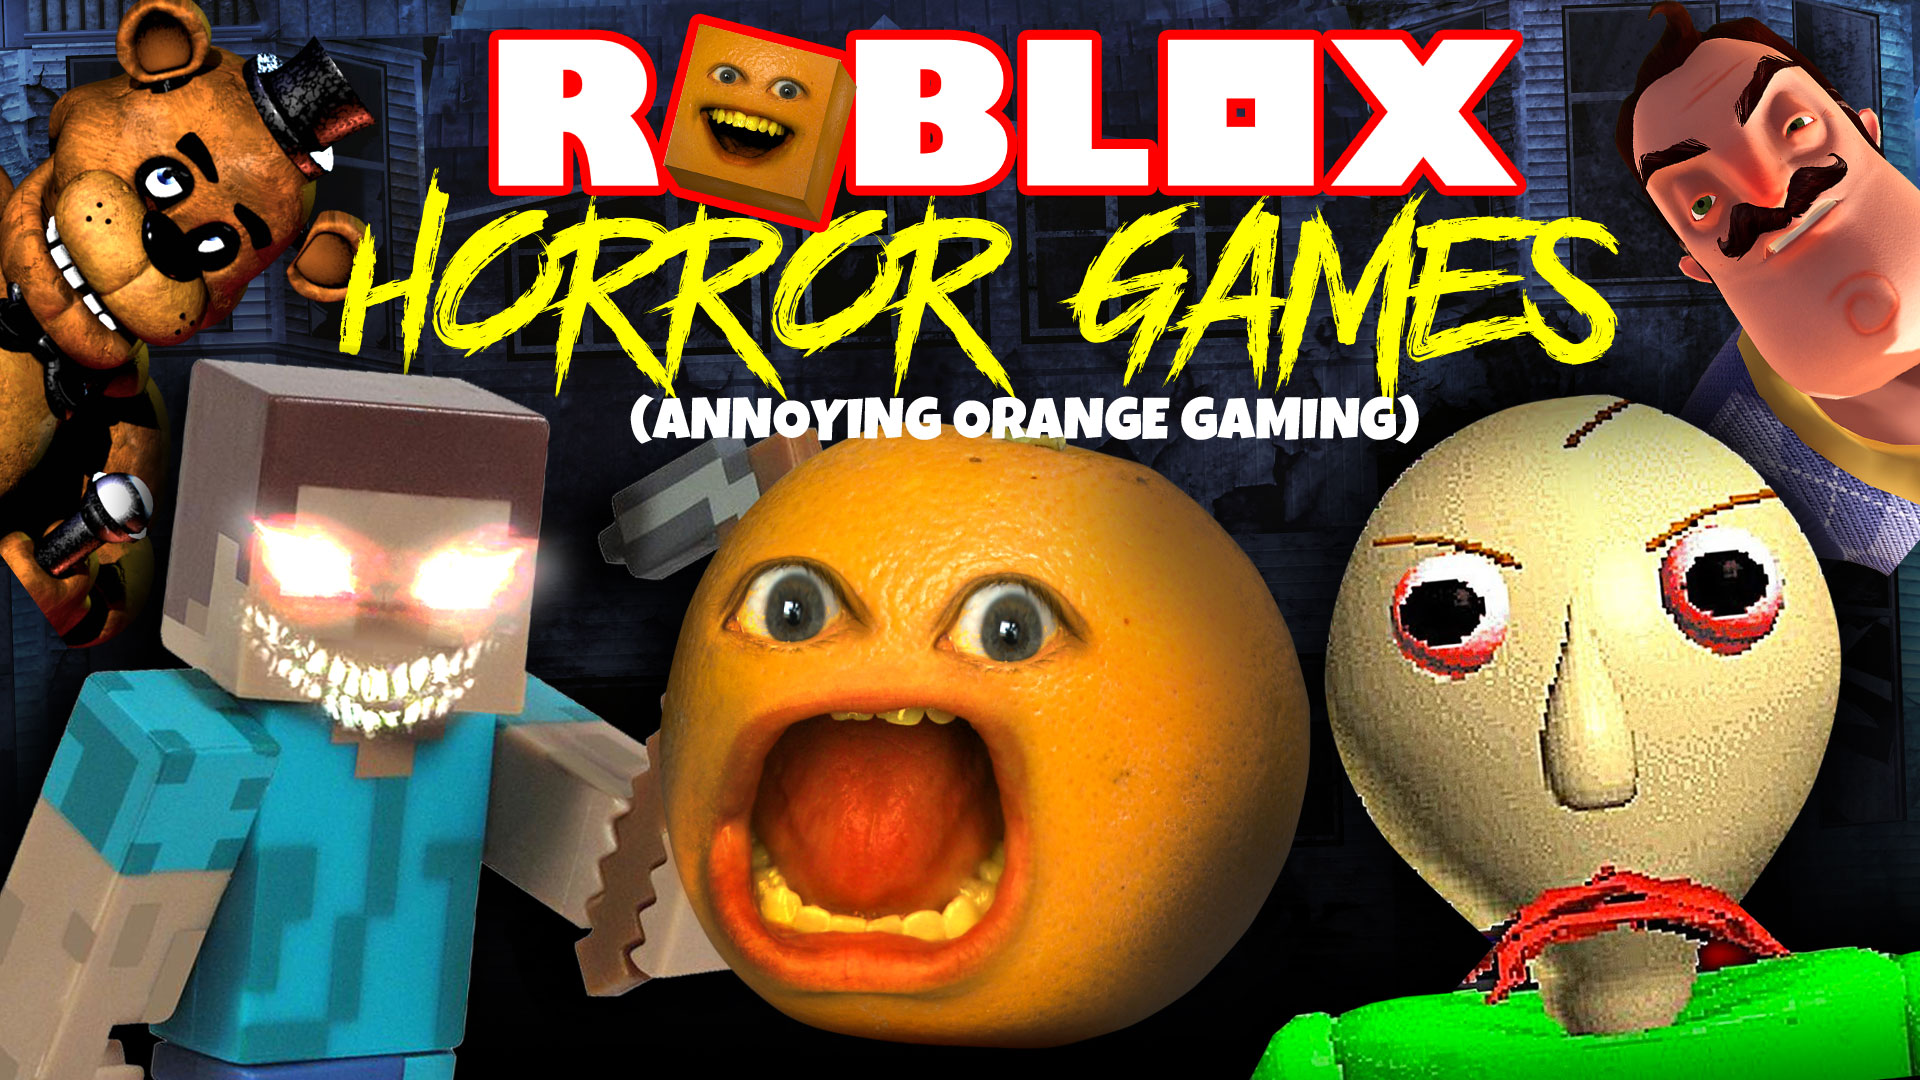 Roblox Oof Annoying Orange Plays Watch Clip Weirdest Roblox Games Annoying Orange Gaming Prime Video